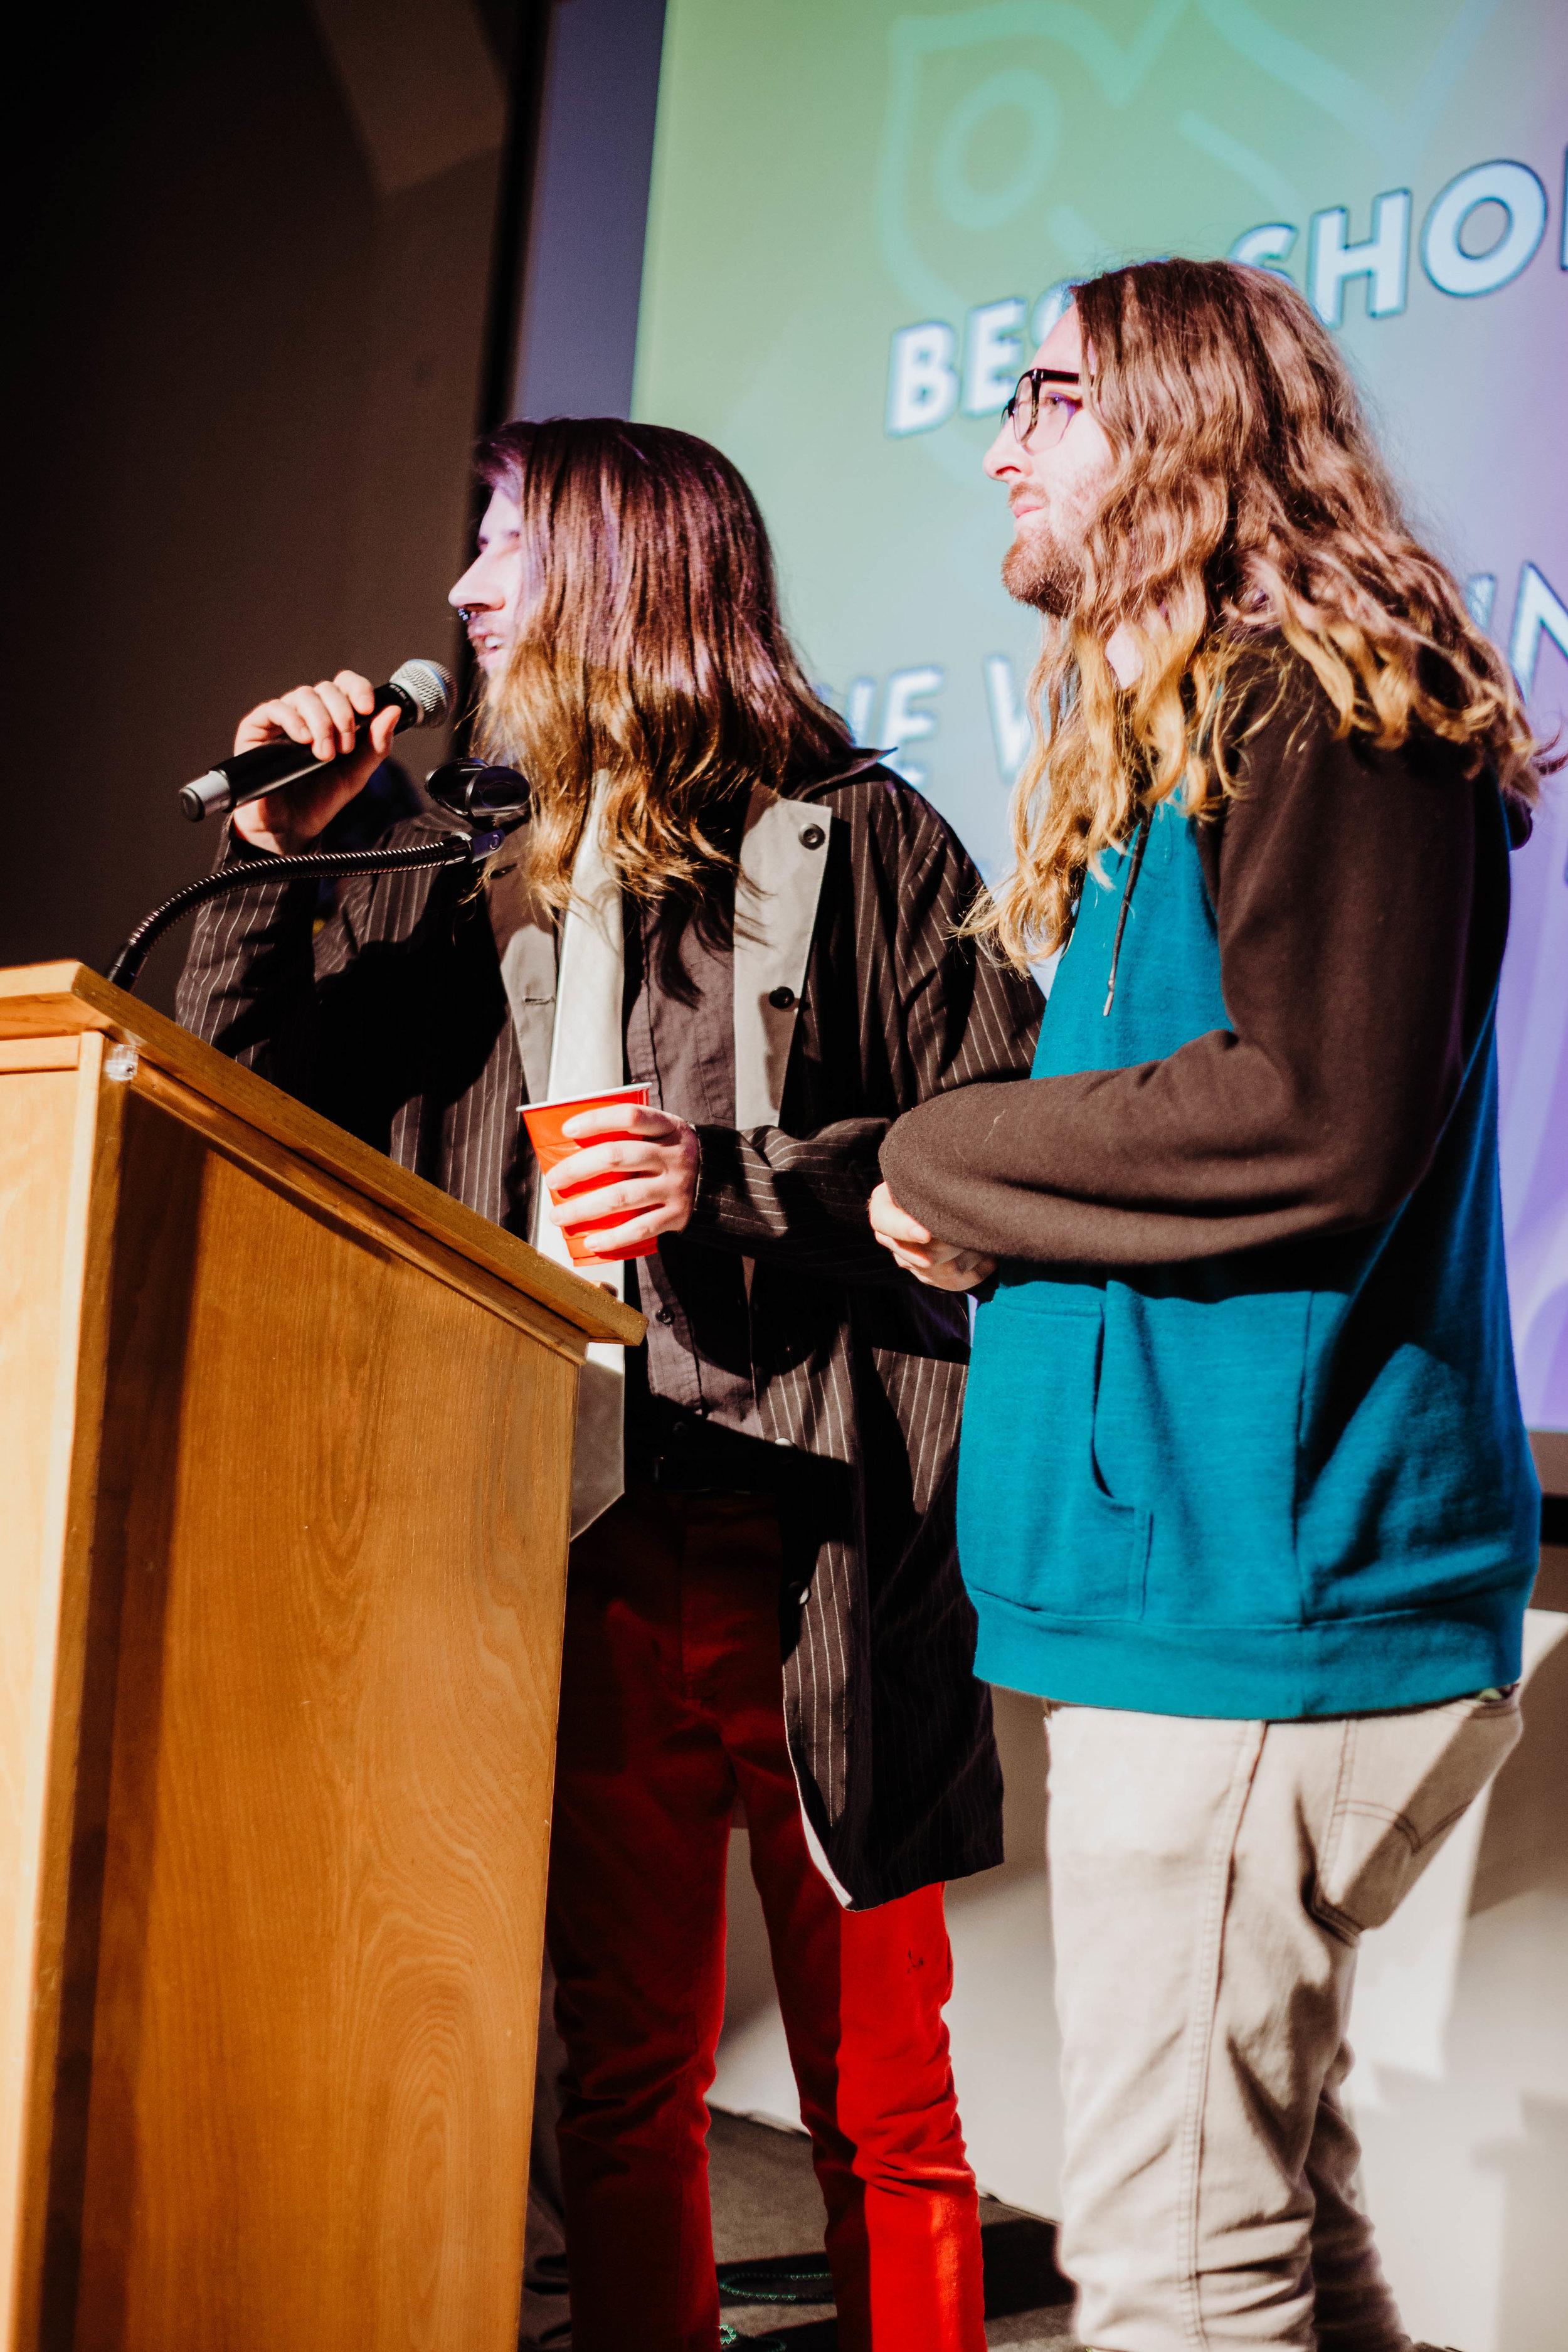 Garrett Smith and Zachariah Walker accepting the award for Best Short Film.